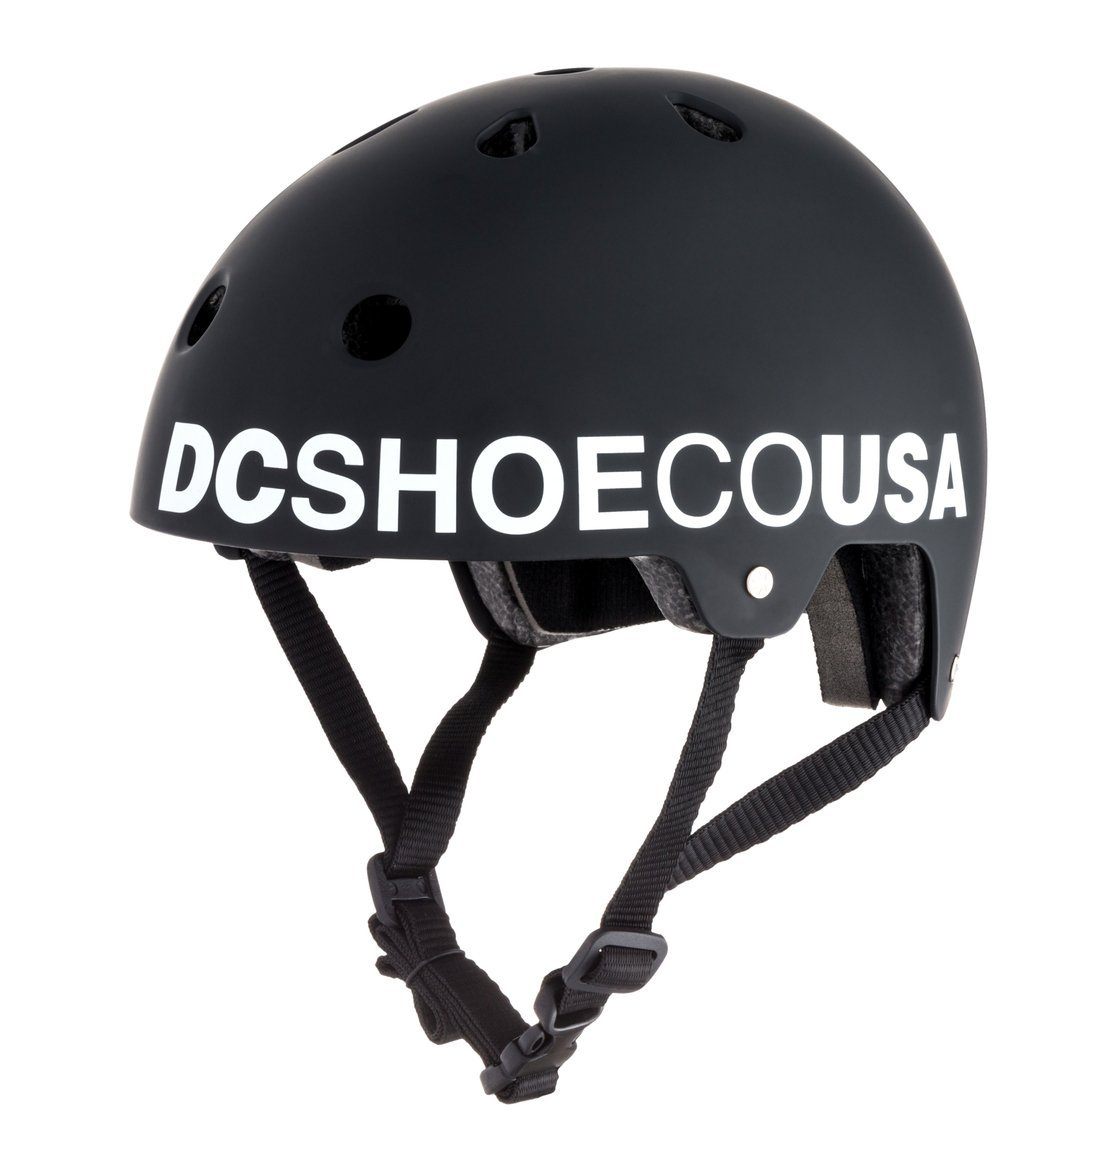 Casco Skate DC DTBES011 Negro Size 56 CM DC SHOE USA